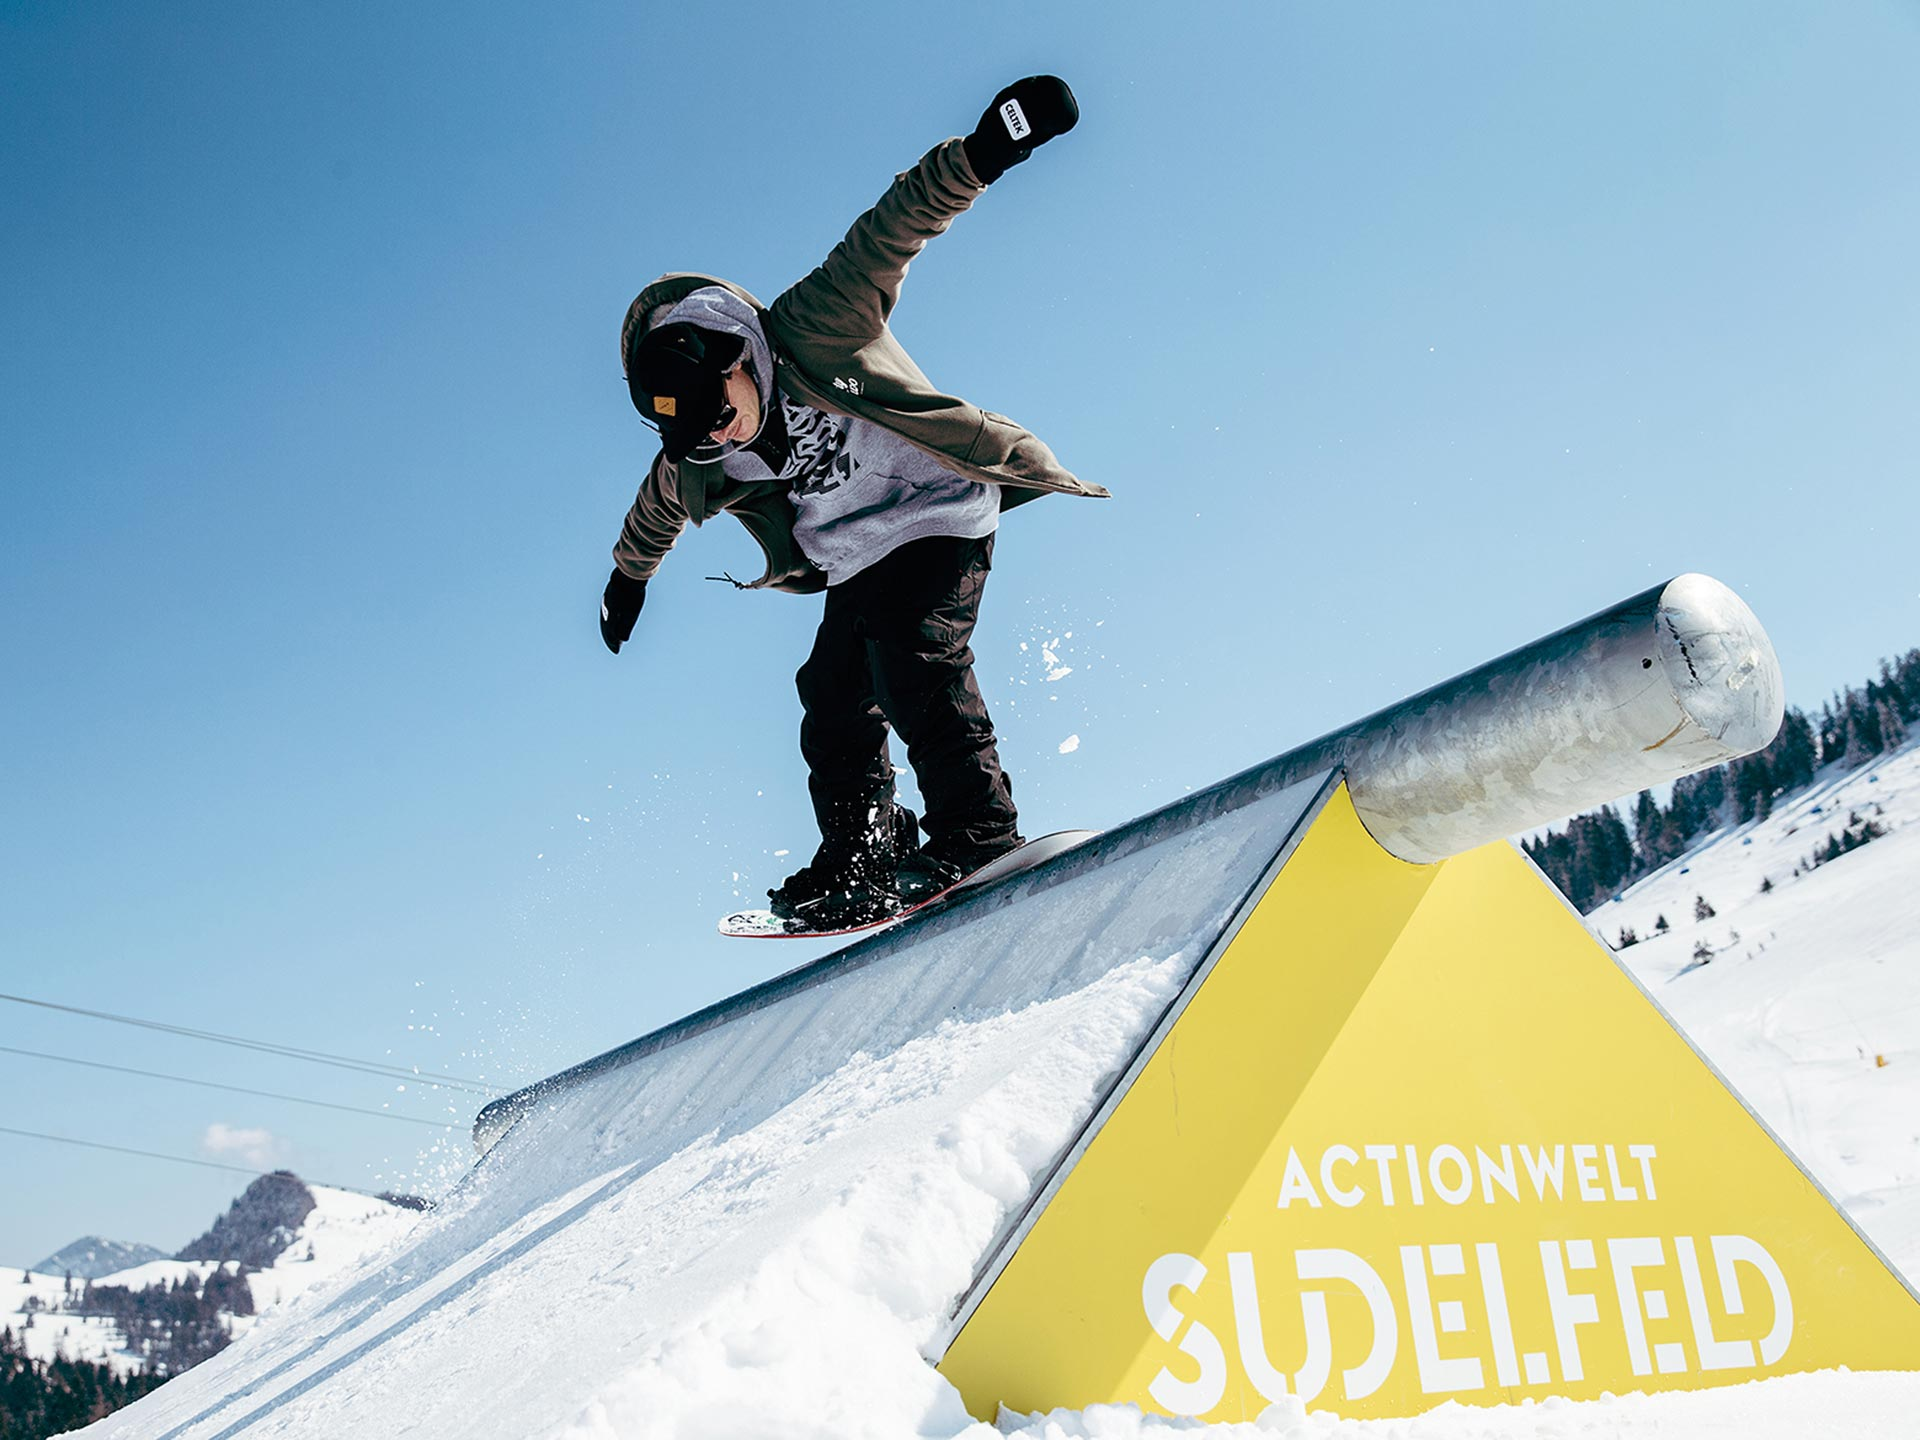 Snowpark Opening in der Actionwelt Sudelfeld - Rider: Michael Botzenhart - Foto: Martin Erd